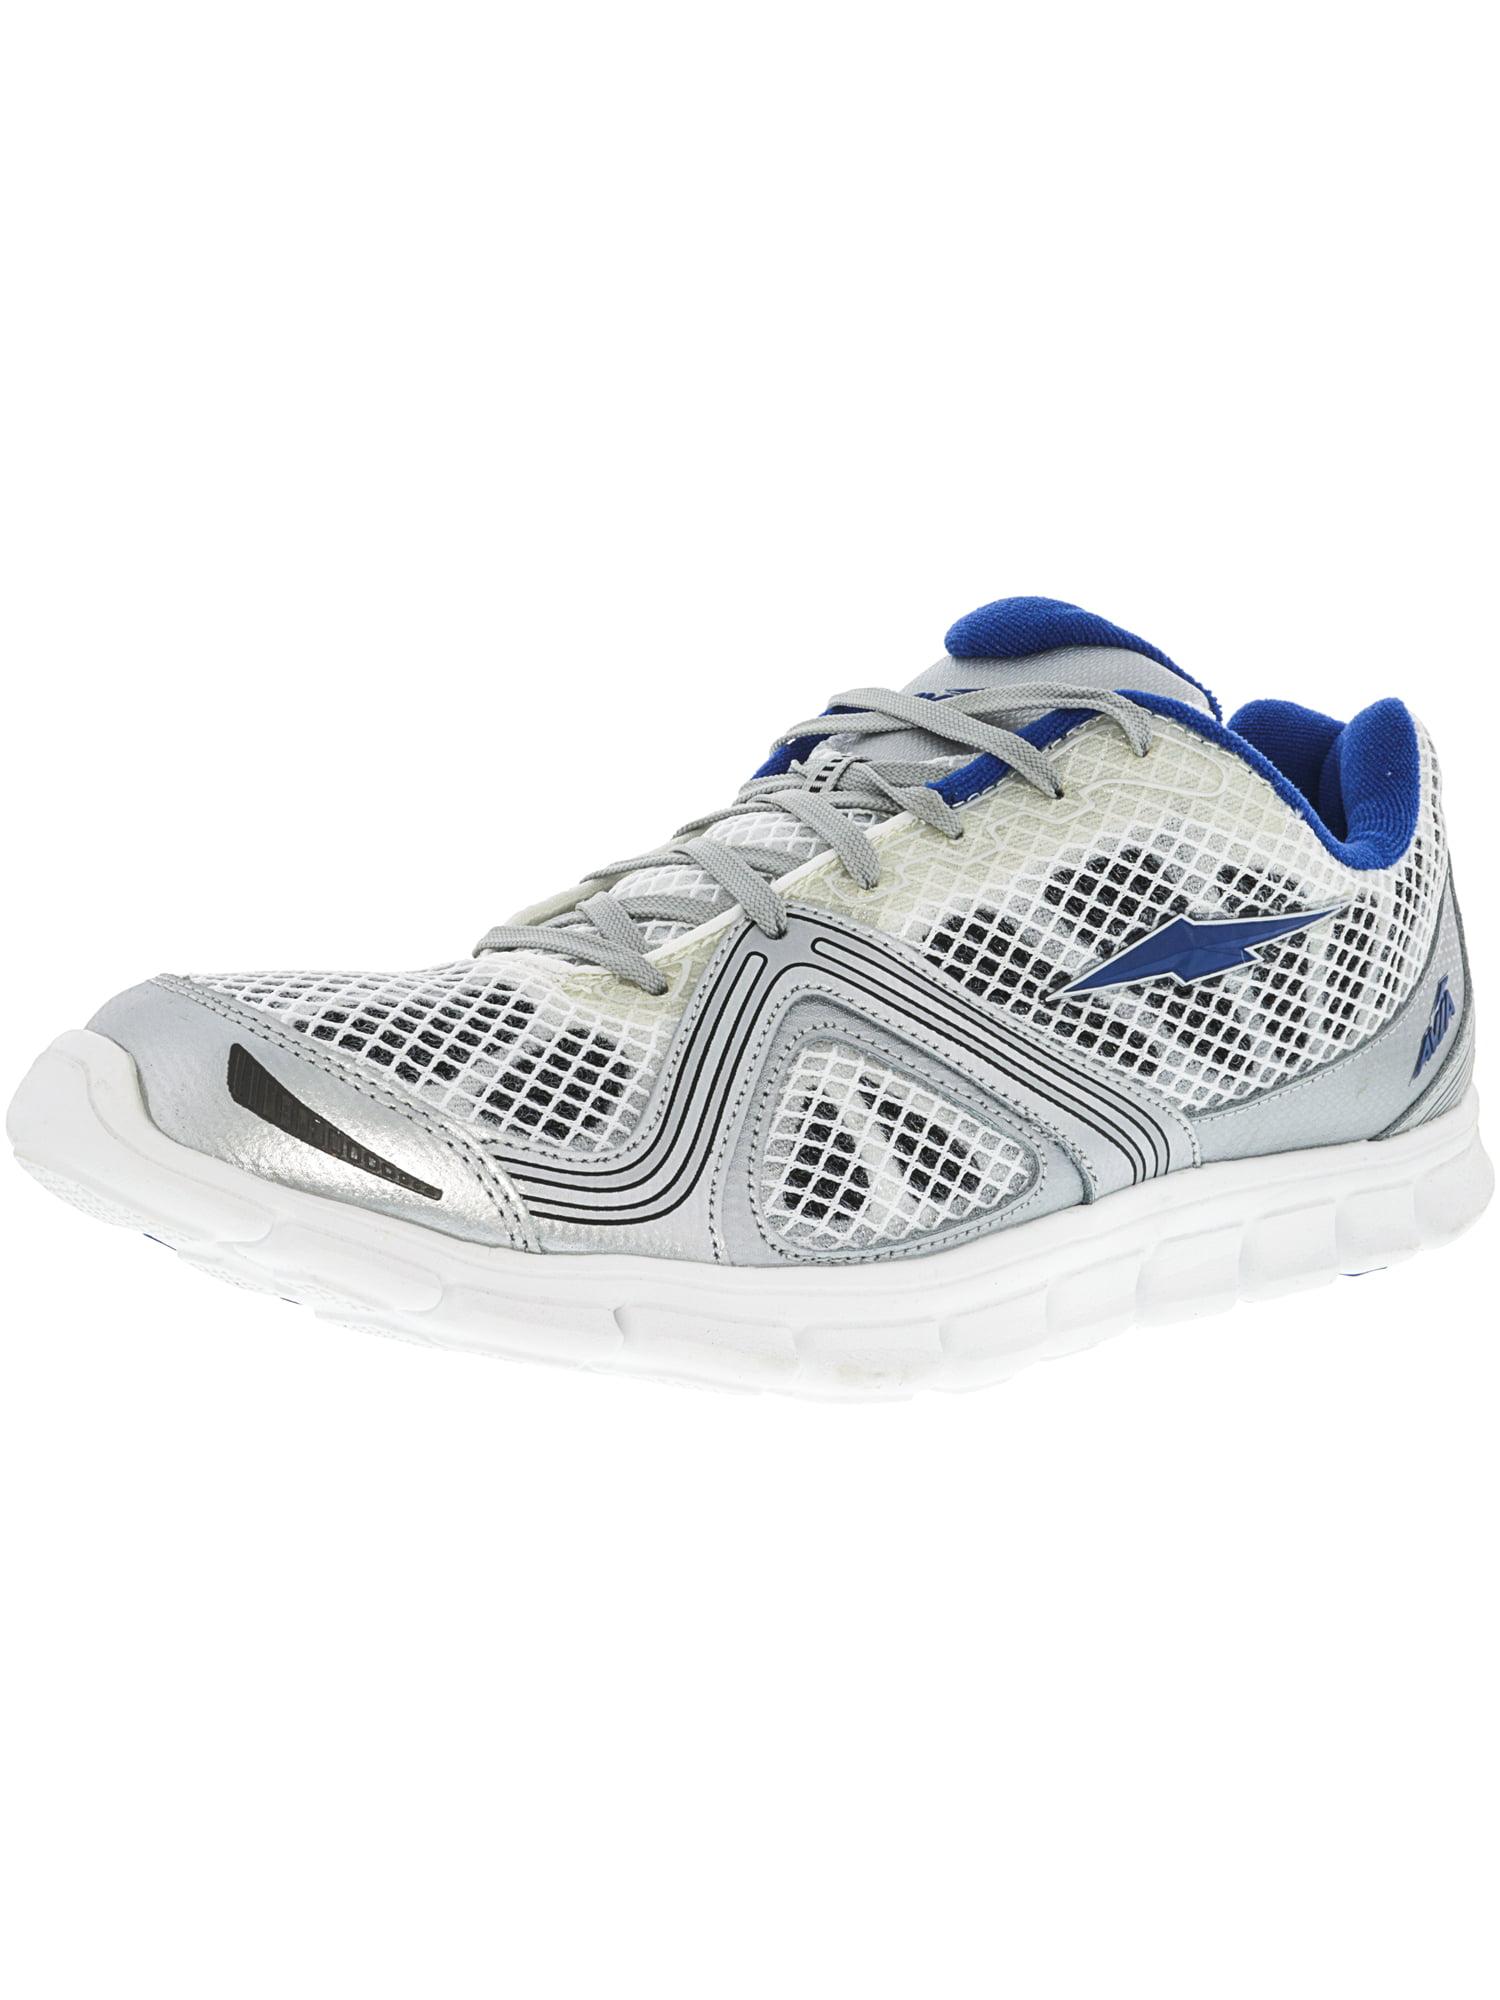 Avia Men's A1516Mwvd White   Dark Grey Navy Ankle-High Running Shoe 13M by Avia